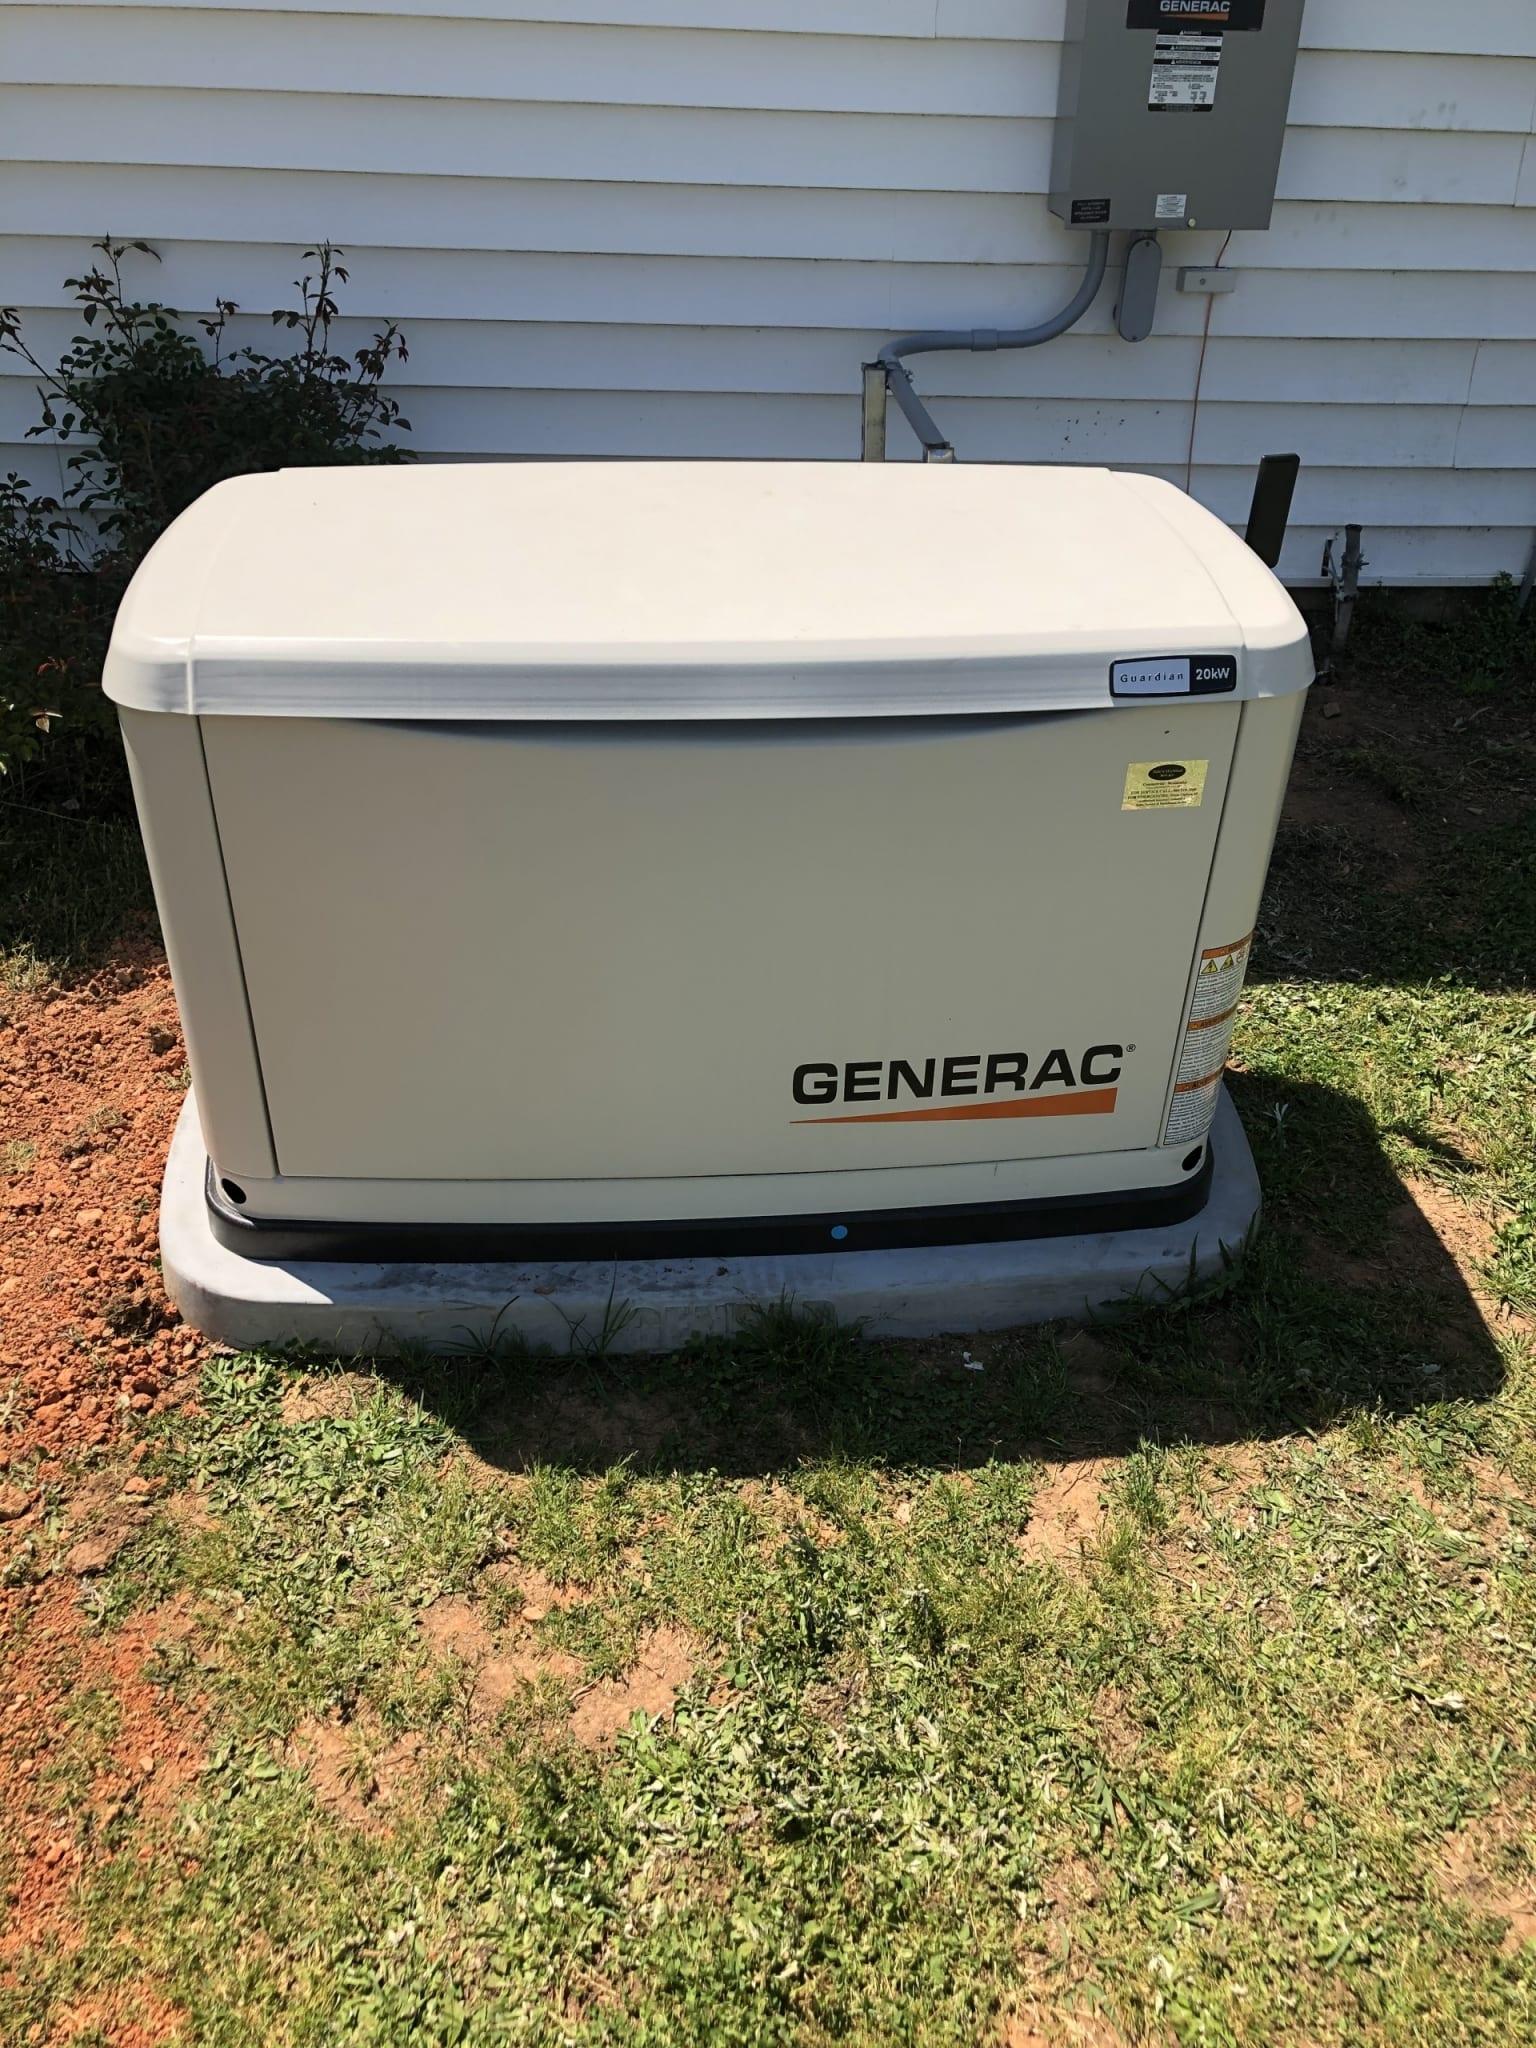 4.28.21 Dinwiddie Generac Automatic Standby Generator